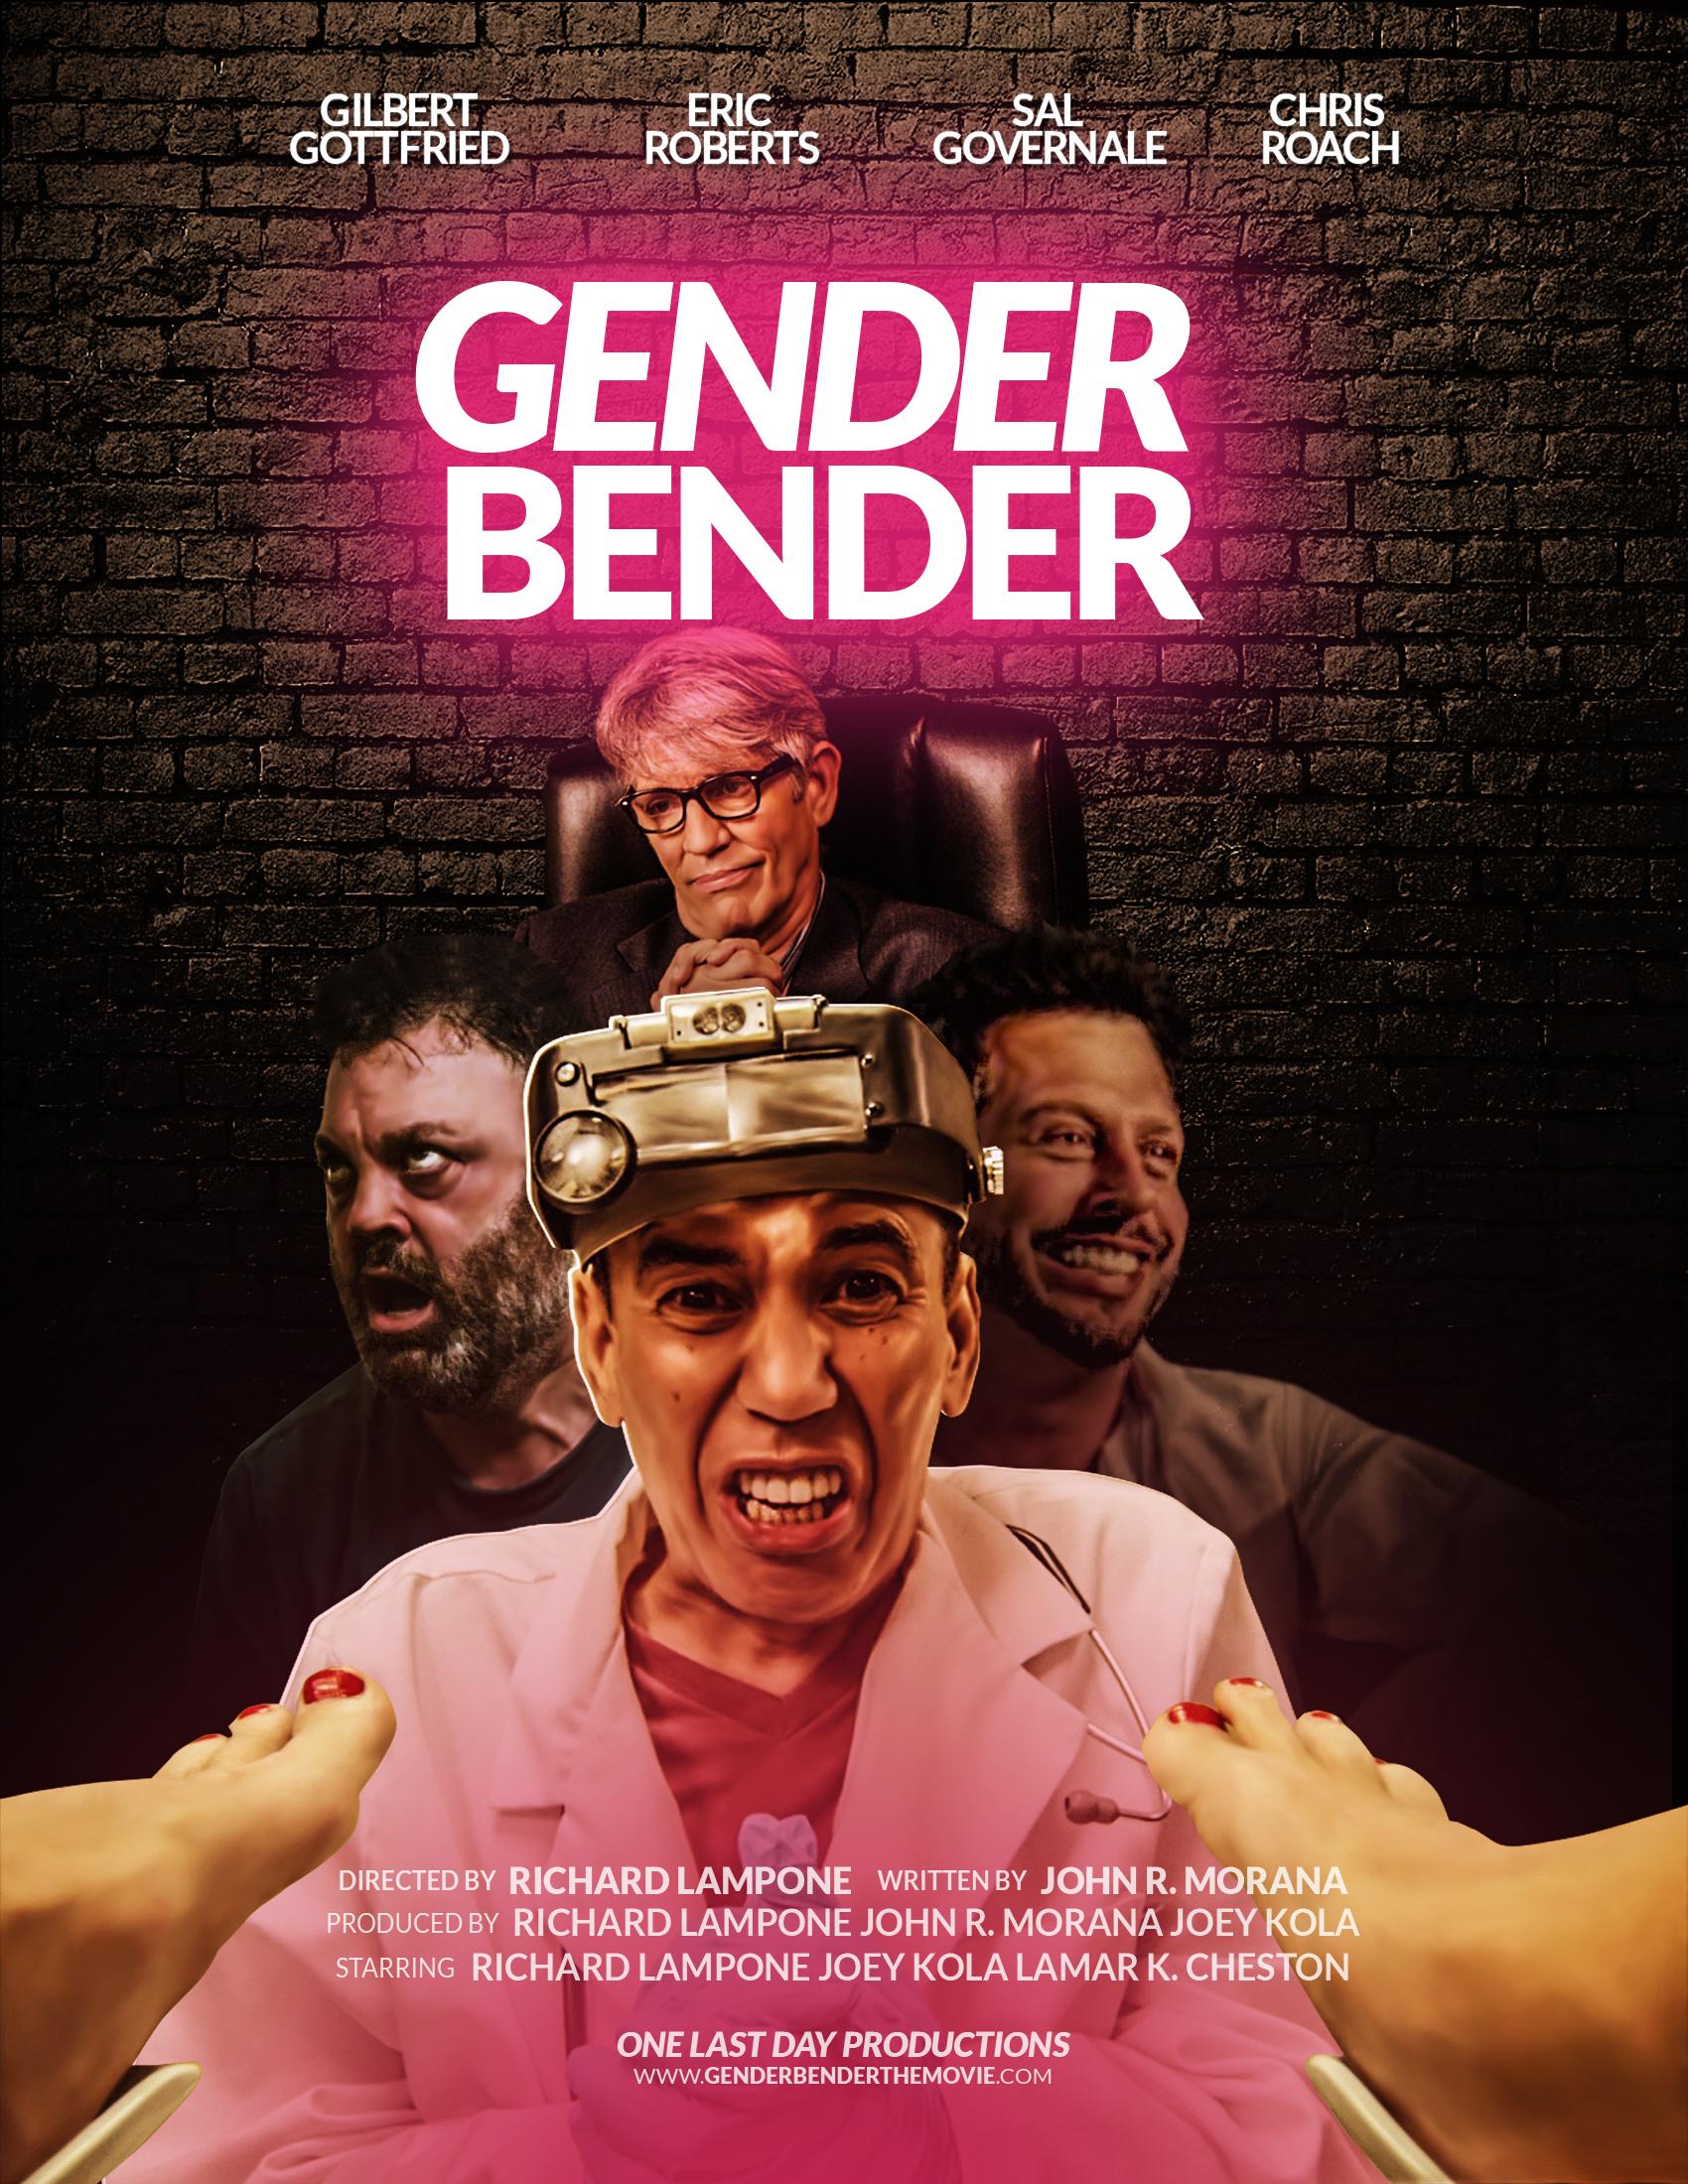 Otb Porn Star David - Gender Bender (2016) - IMDb